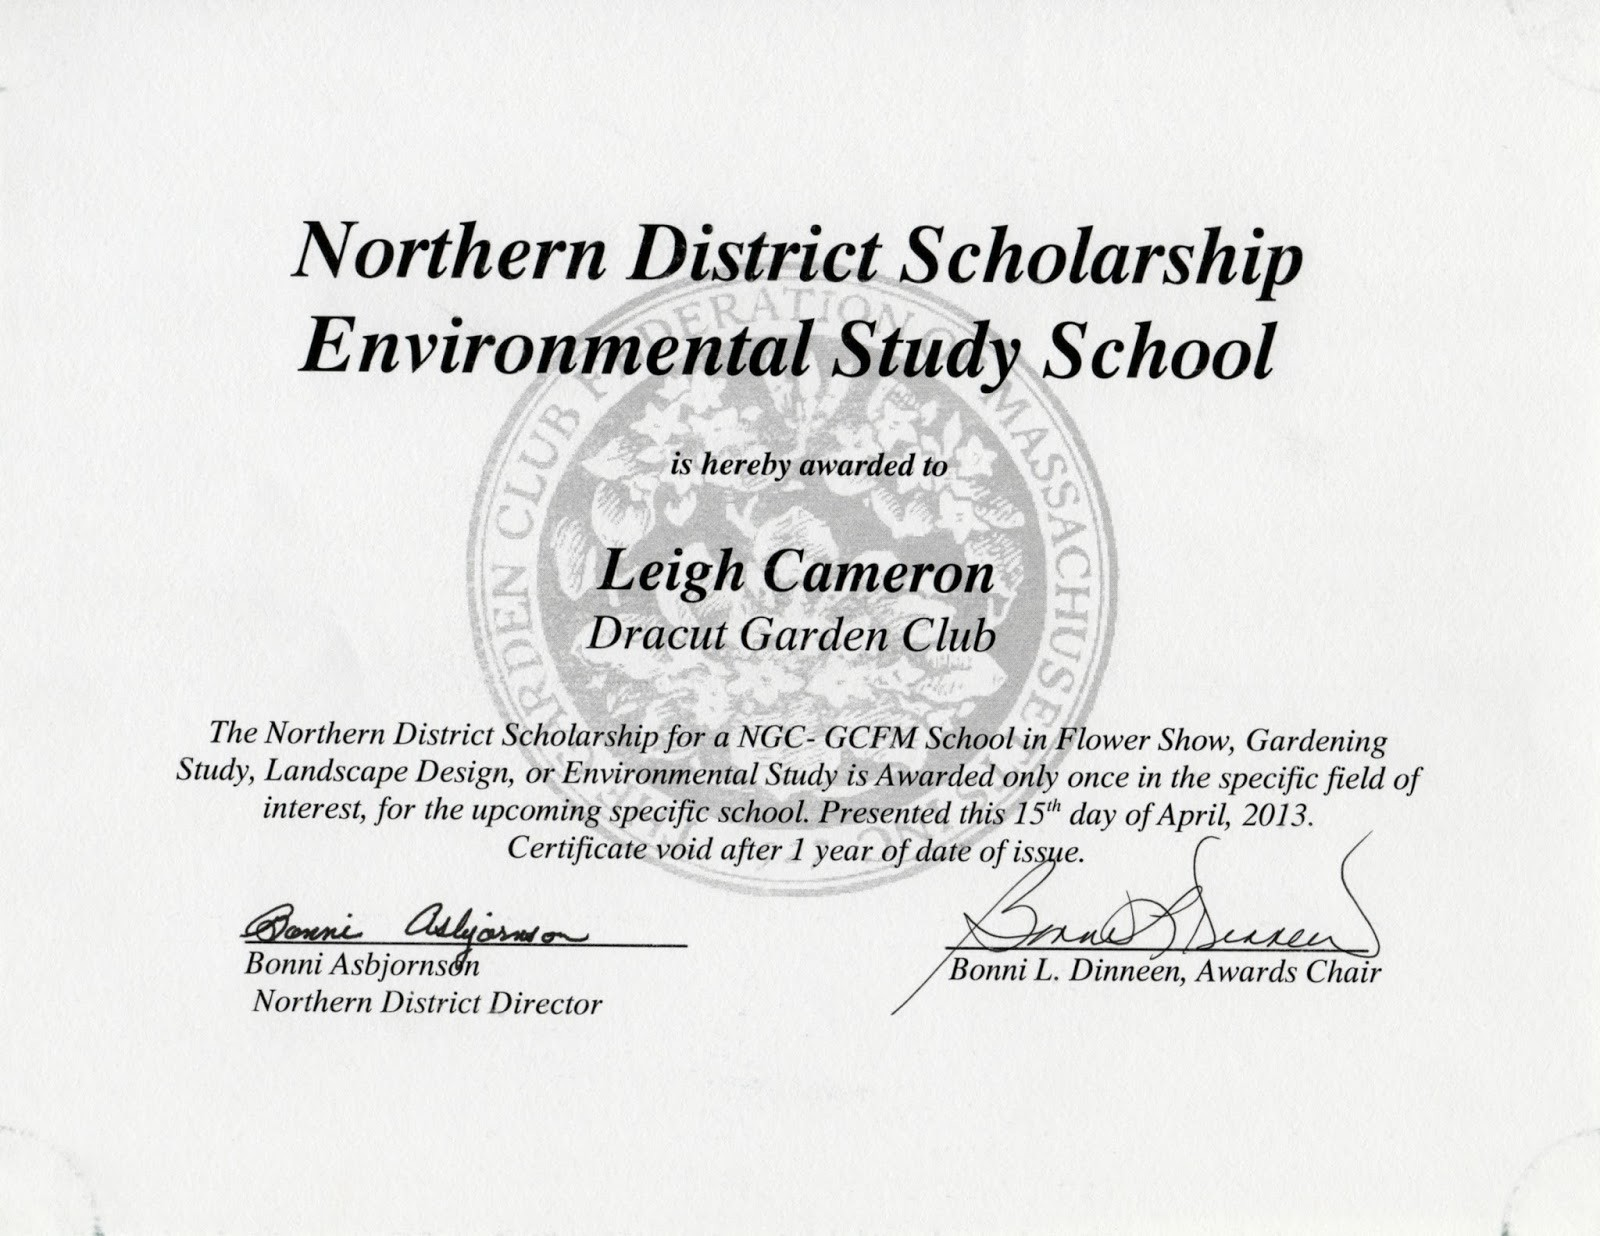 Scholarship Award Certificate Template Free Unique Dracut Garden Club Awards